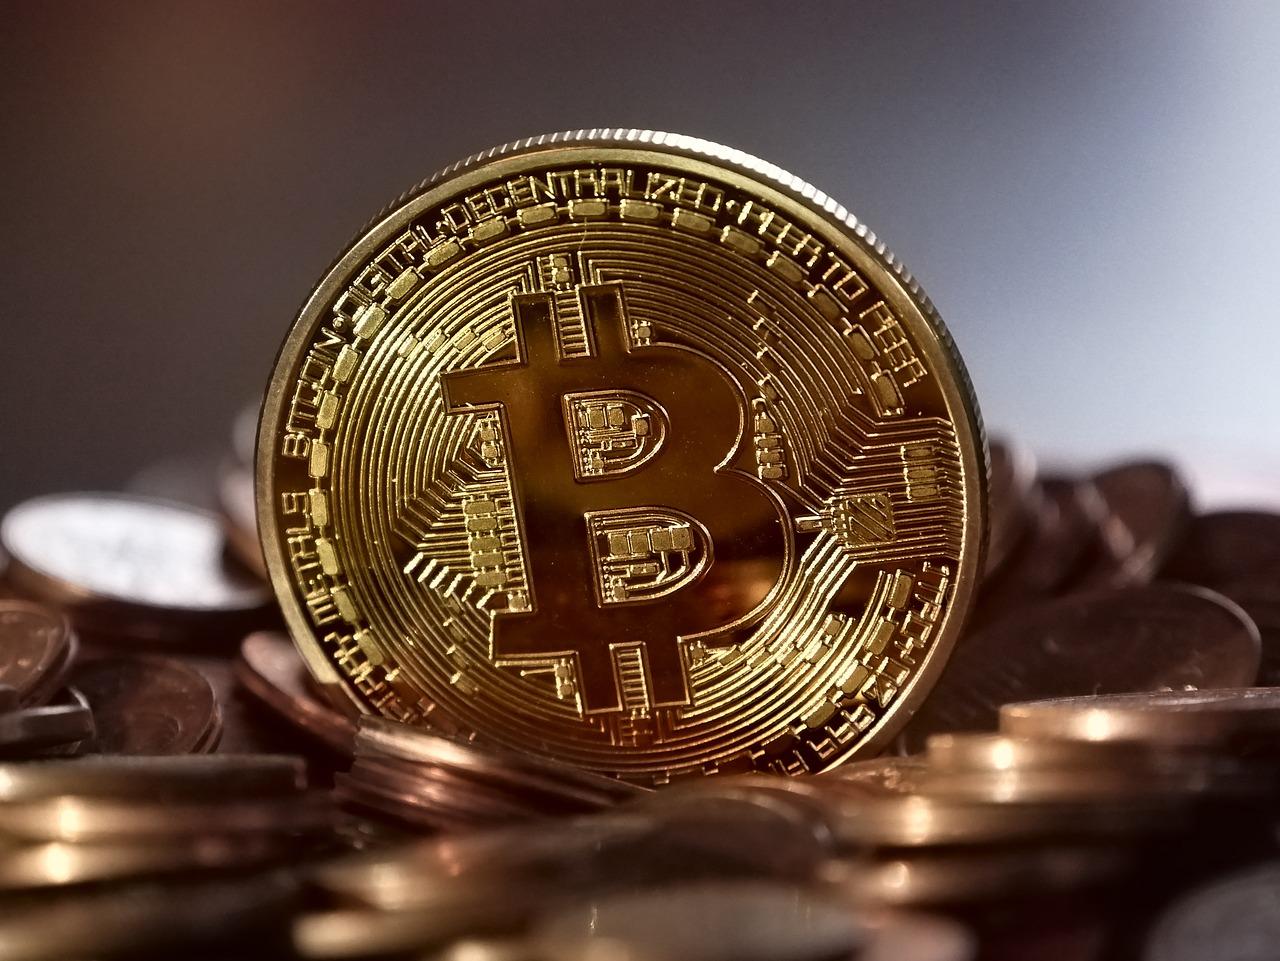 bitcoins-wealth-club-2008262_1280